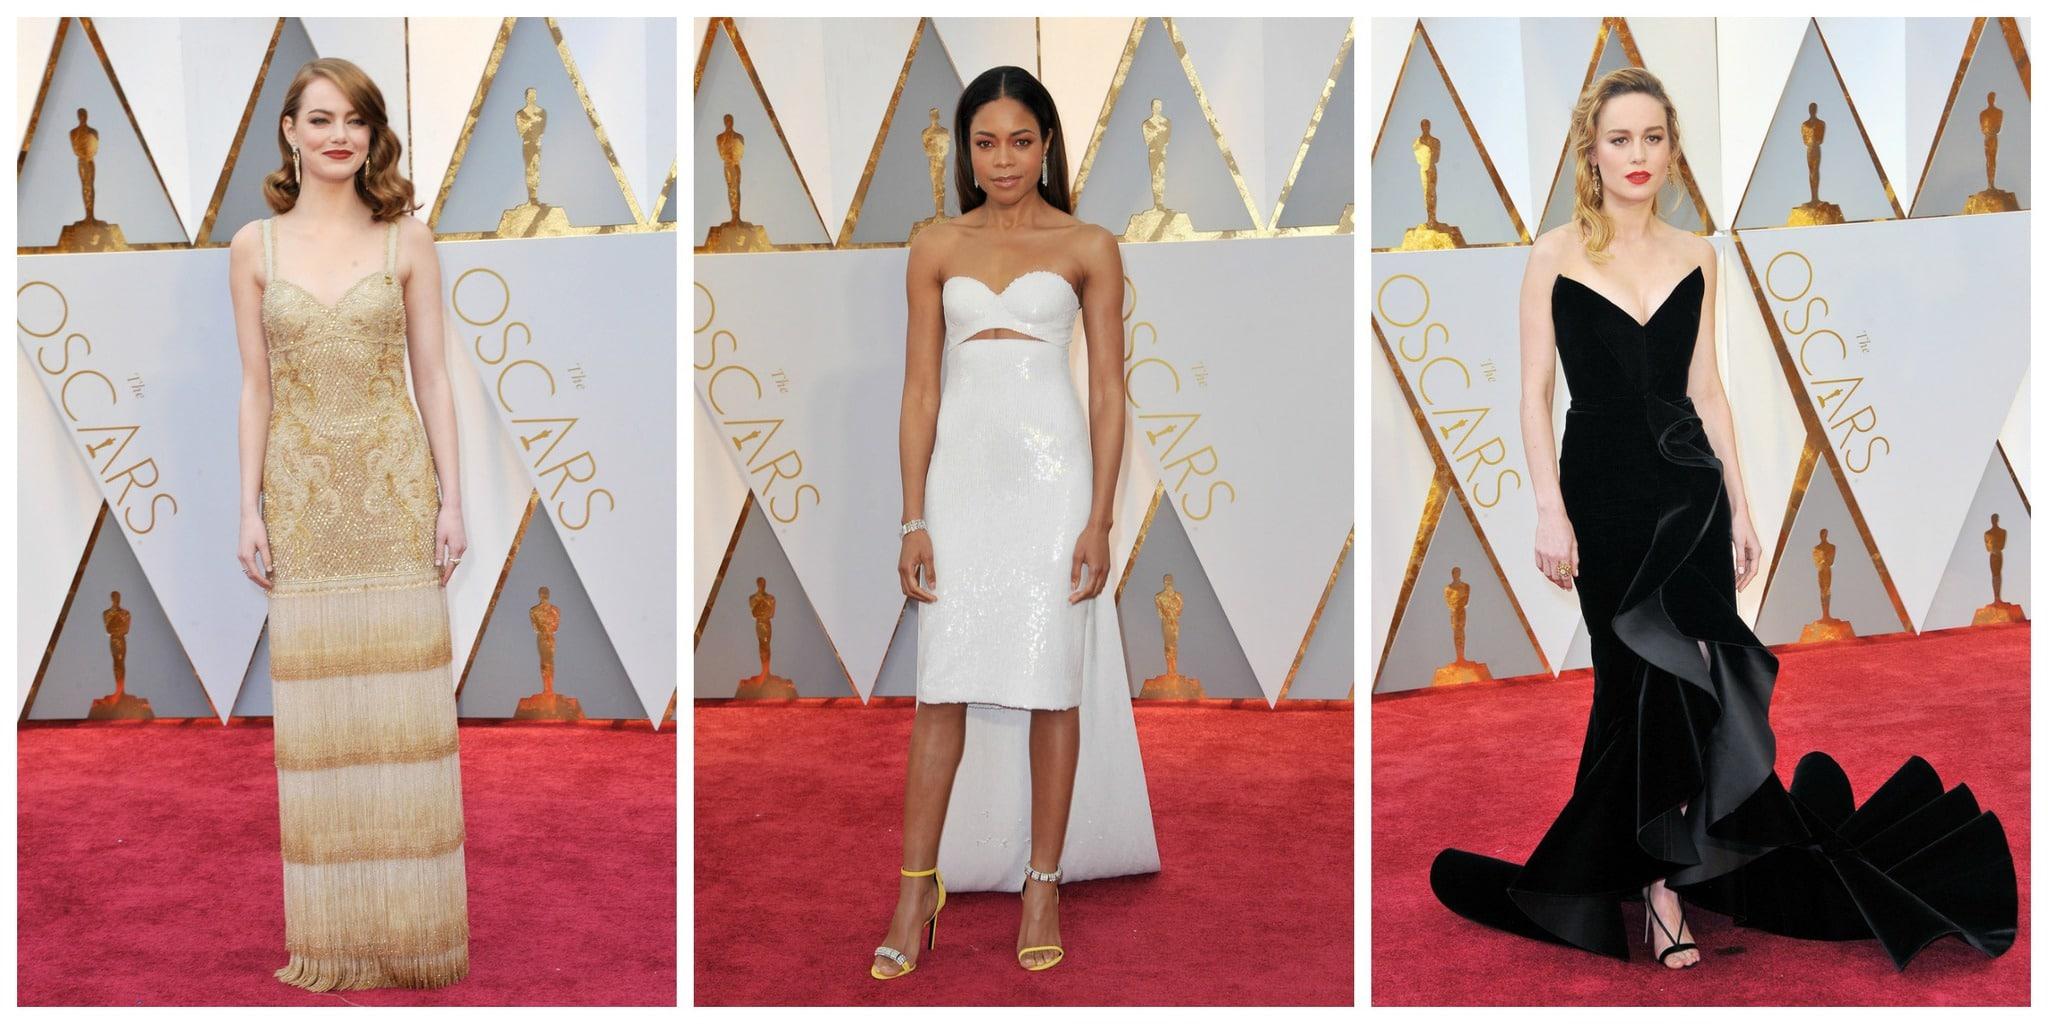 2017 Academy Awards red carpet fashion